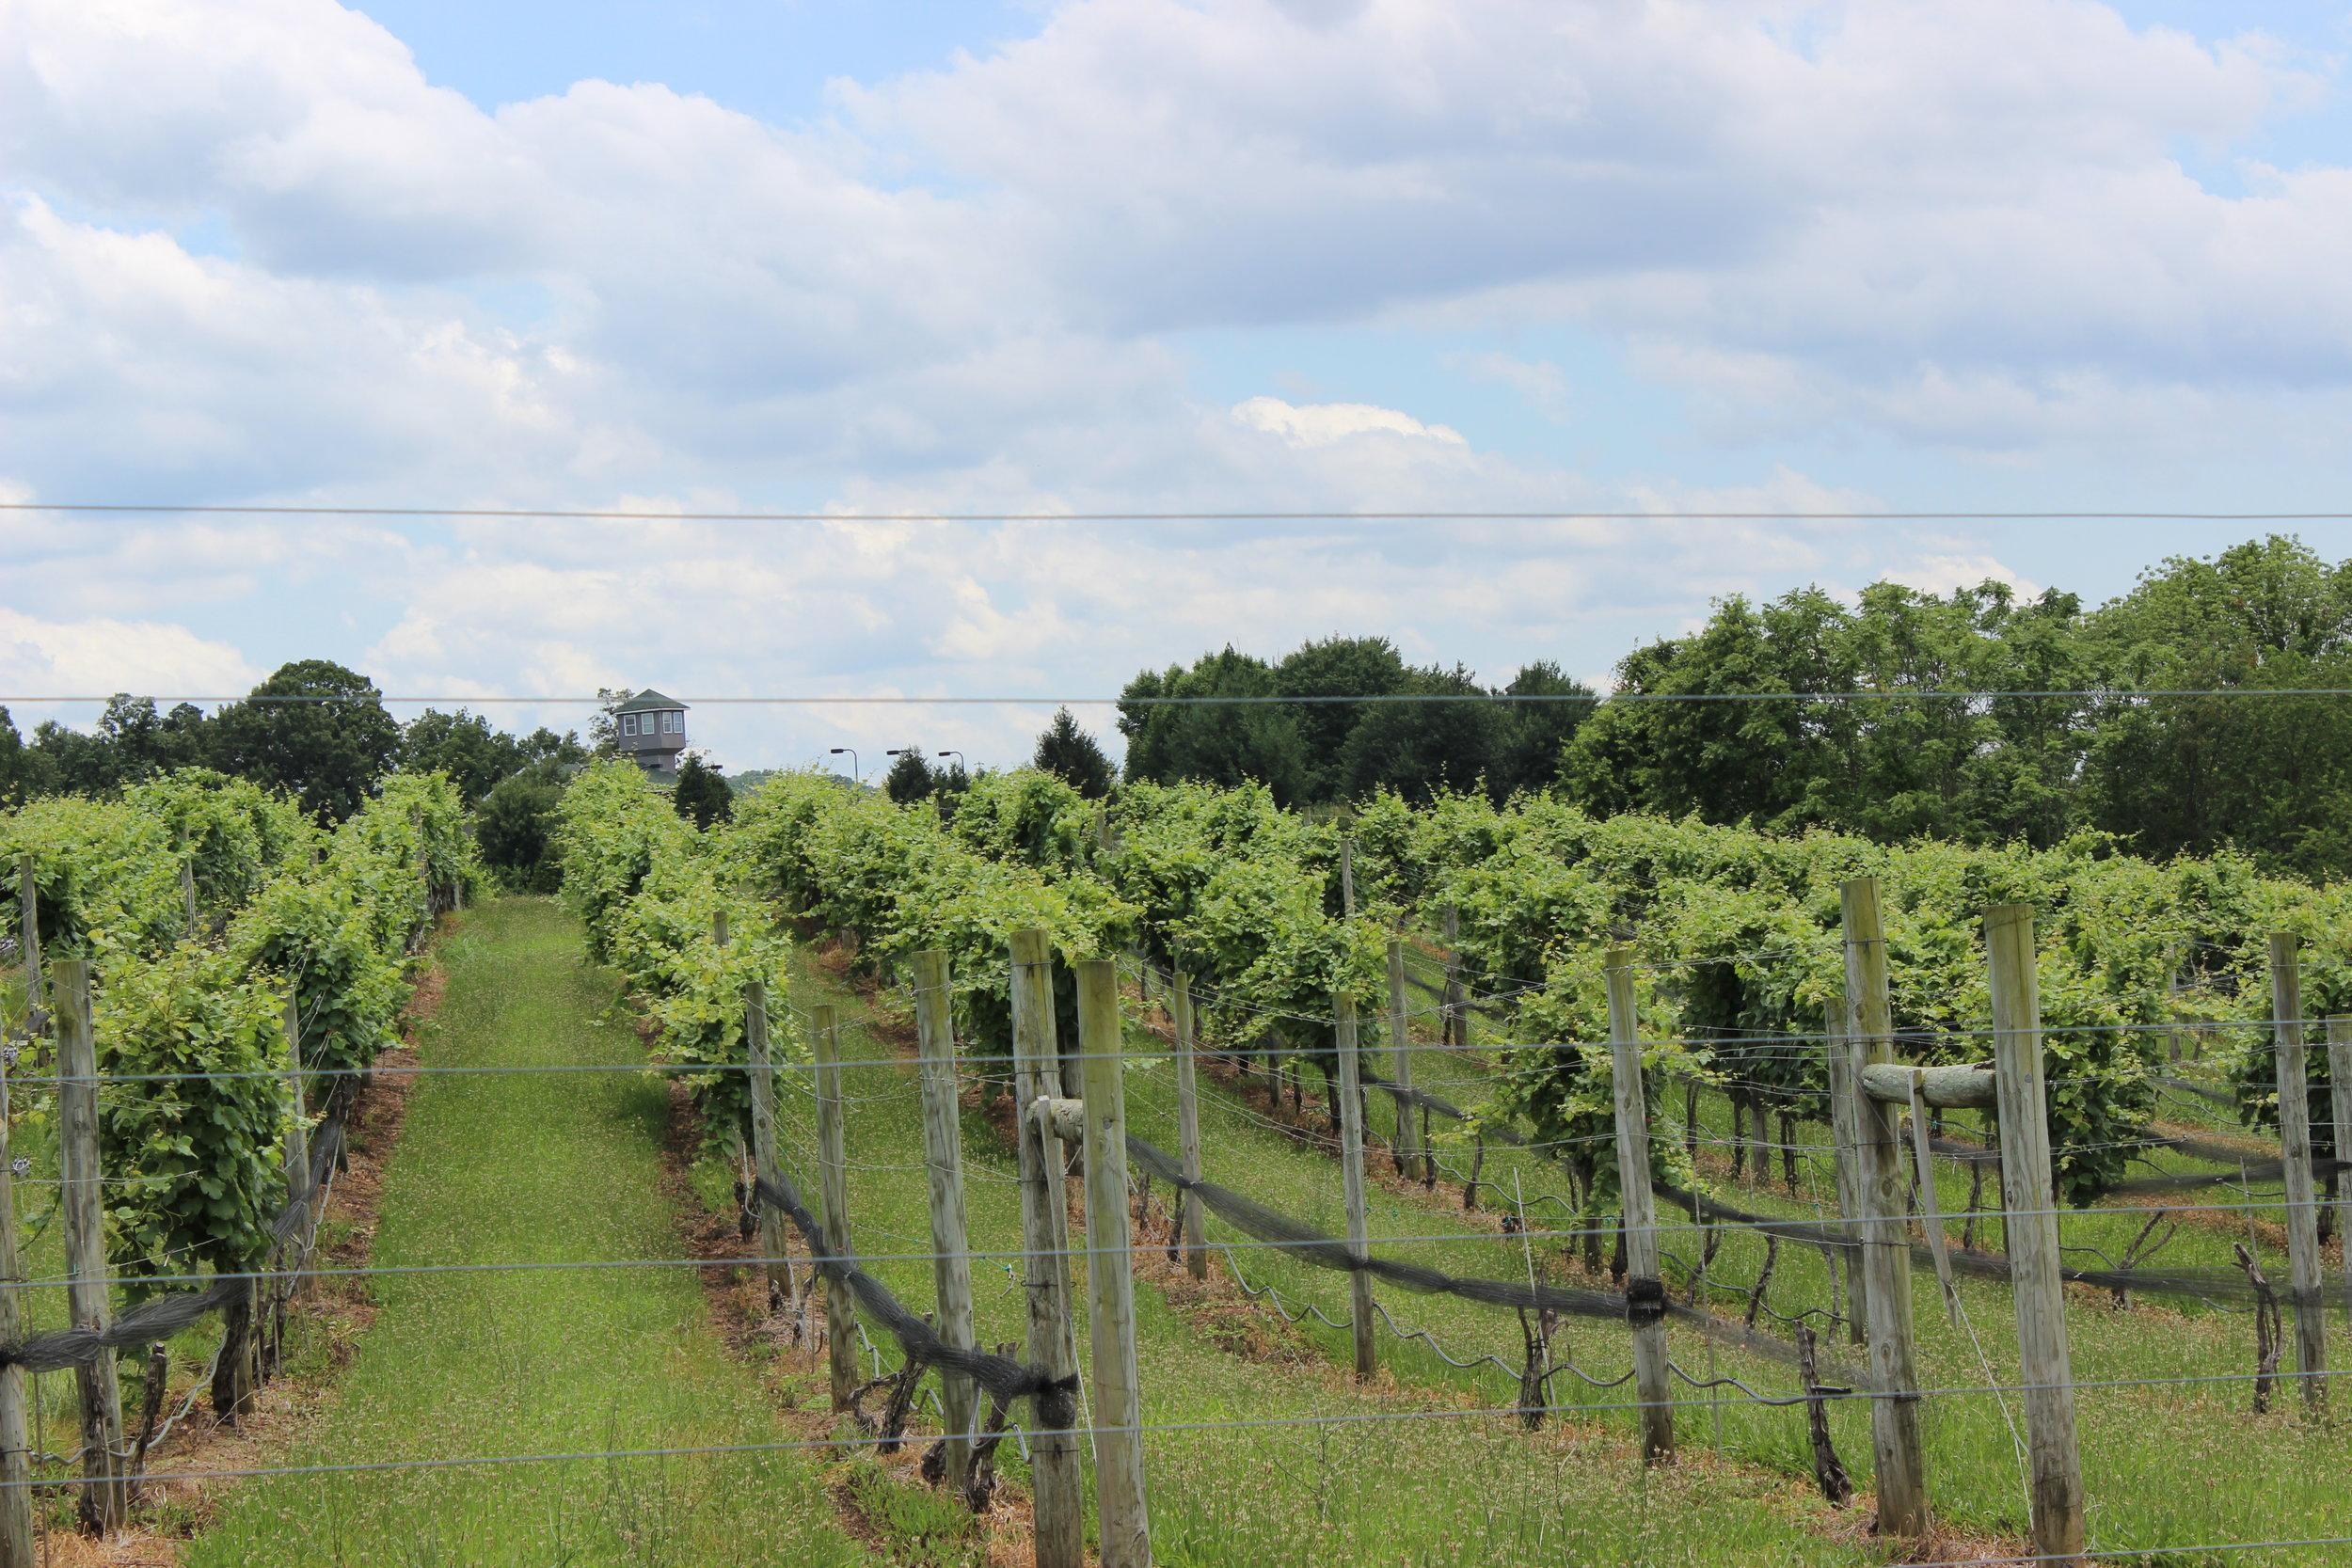 Eagletree Farm Vineyards